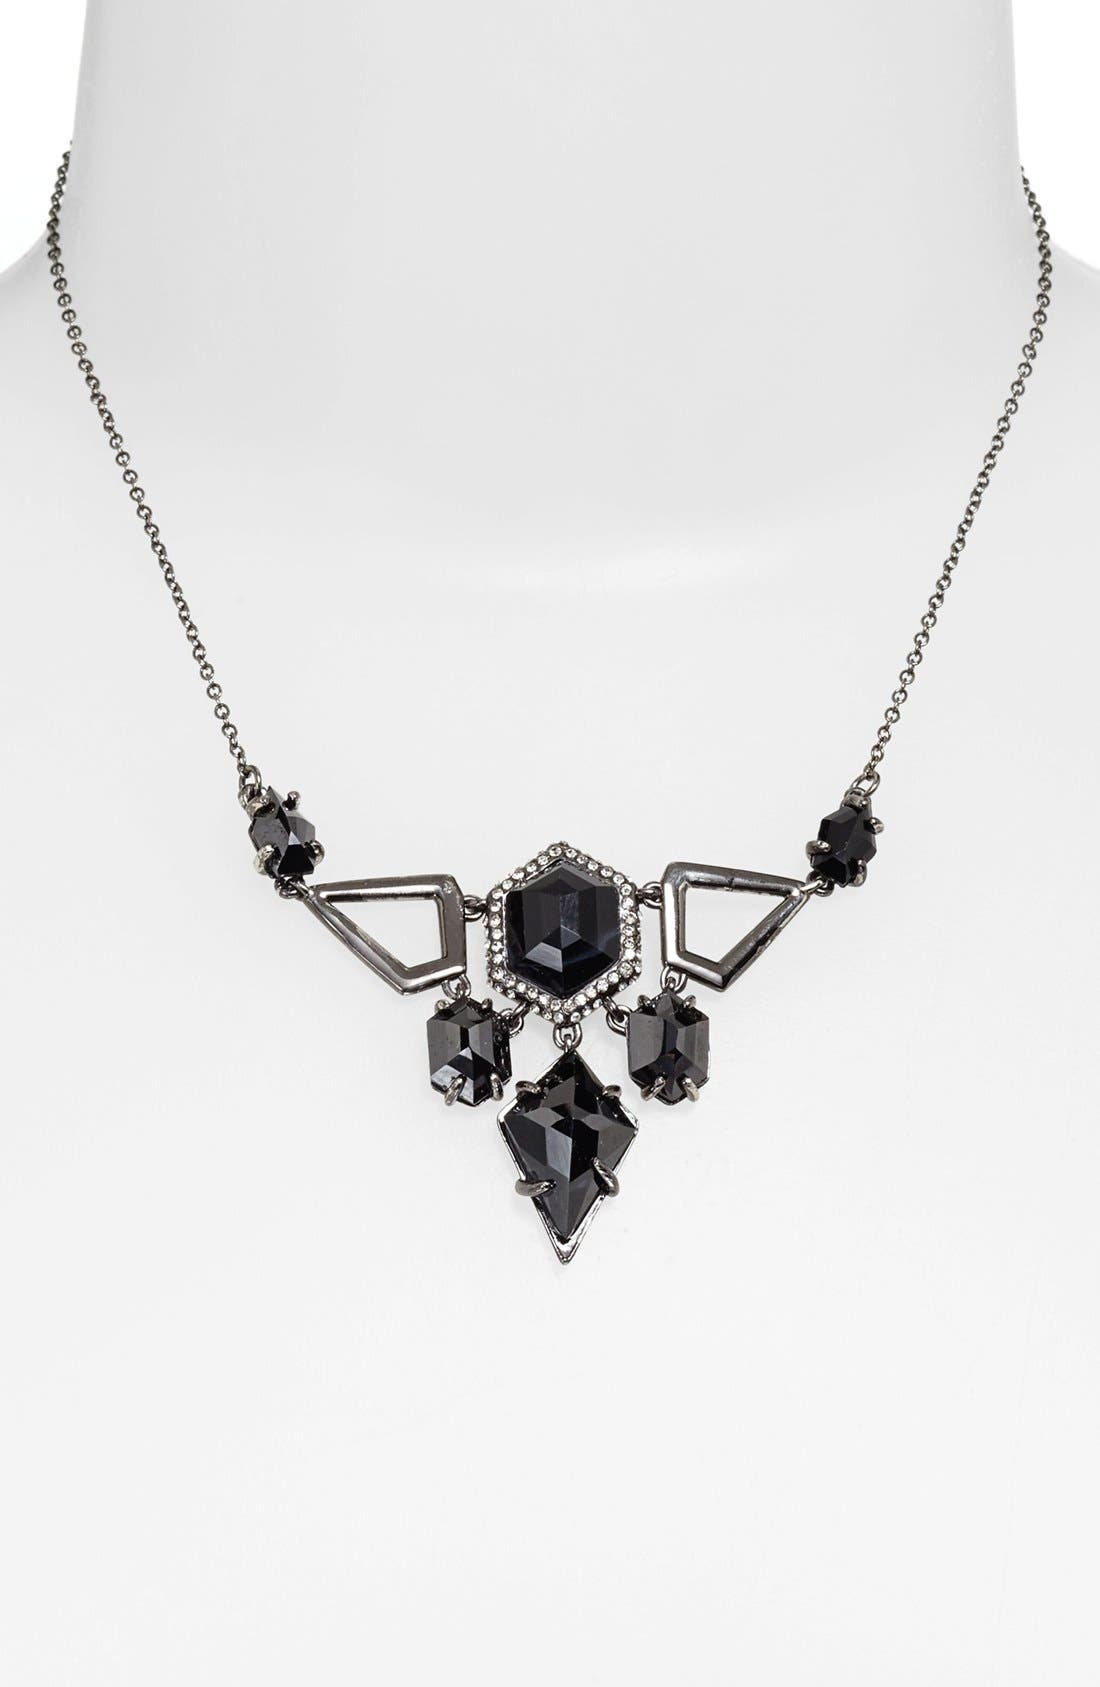 Alternate Image 1 Selected - Alexis Bittar 'Miss Havisham - Pavo' Articulated Pendant Necklace